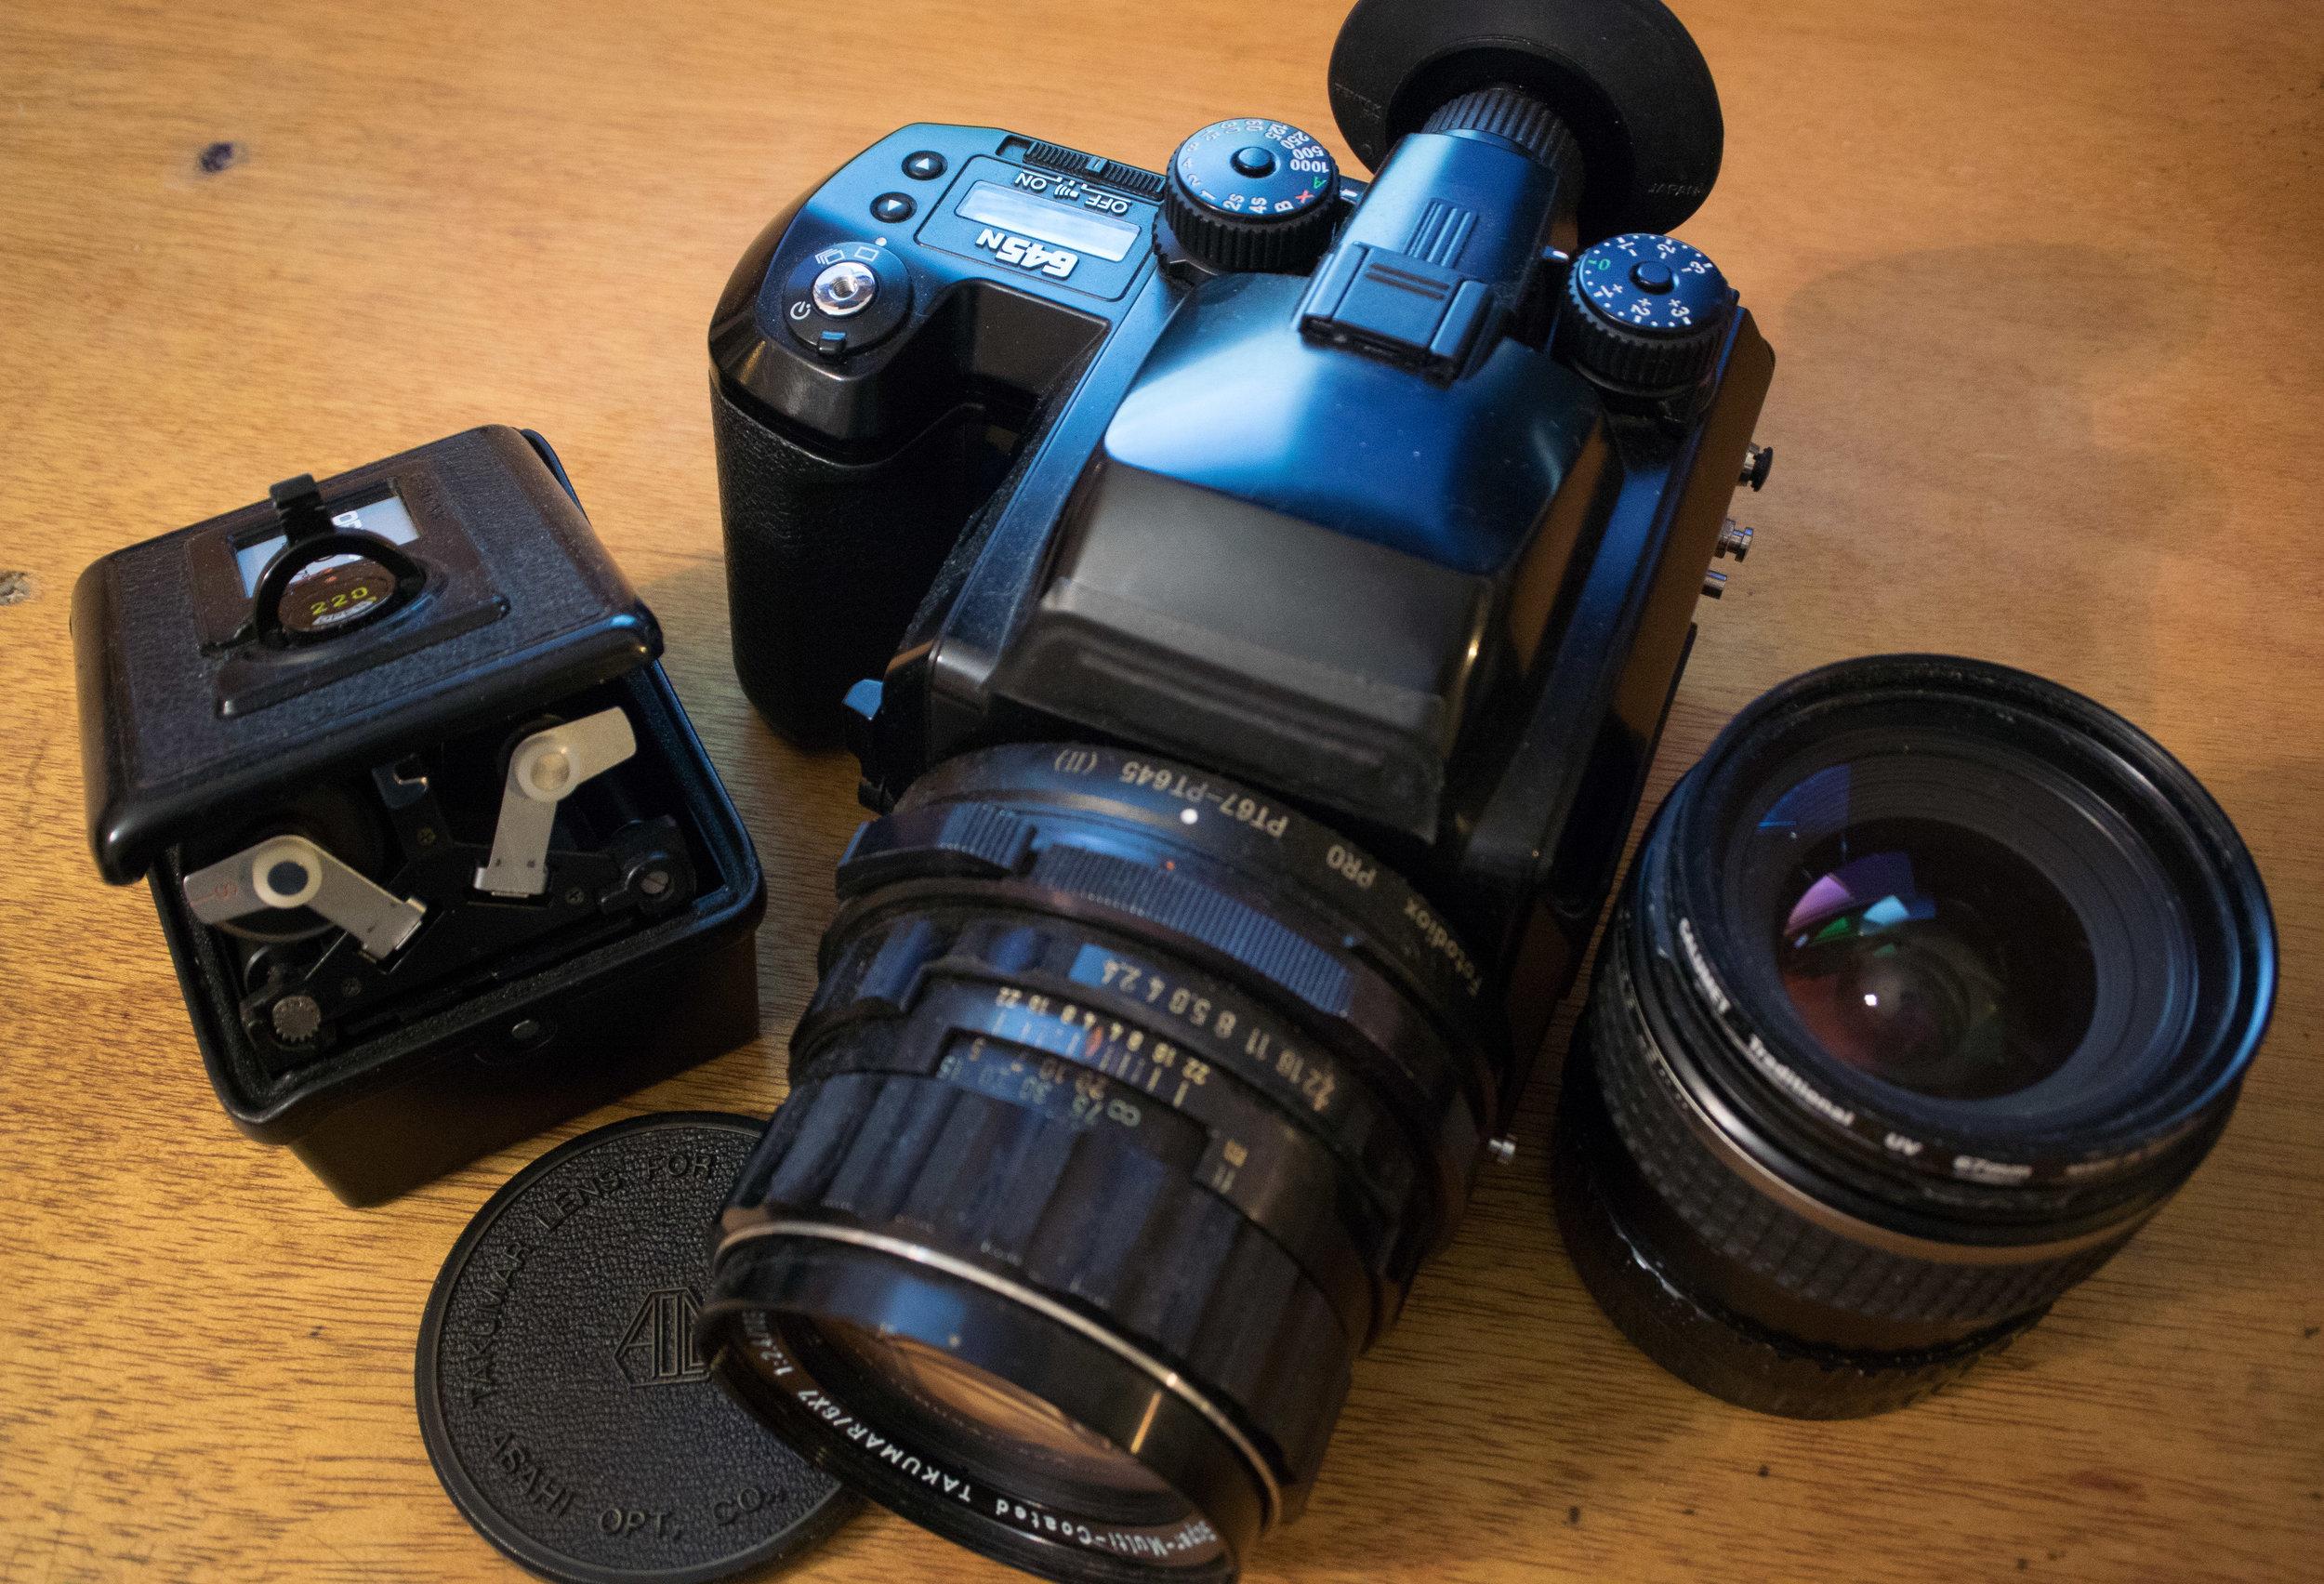 Pentax 645n + 45mm + 105mm + 220 insert